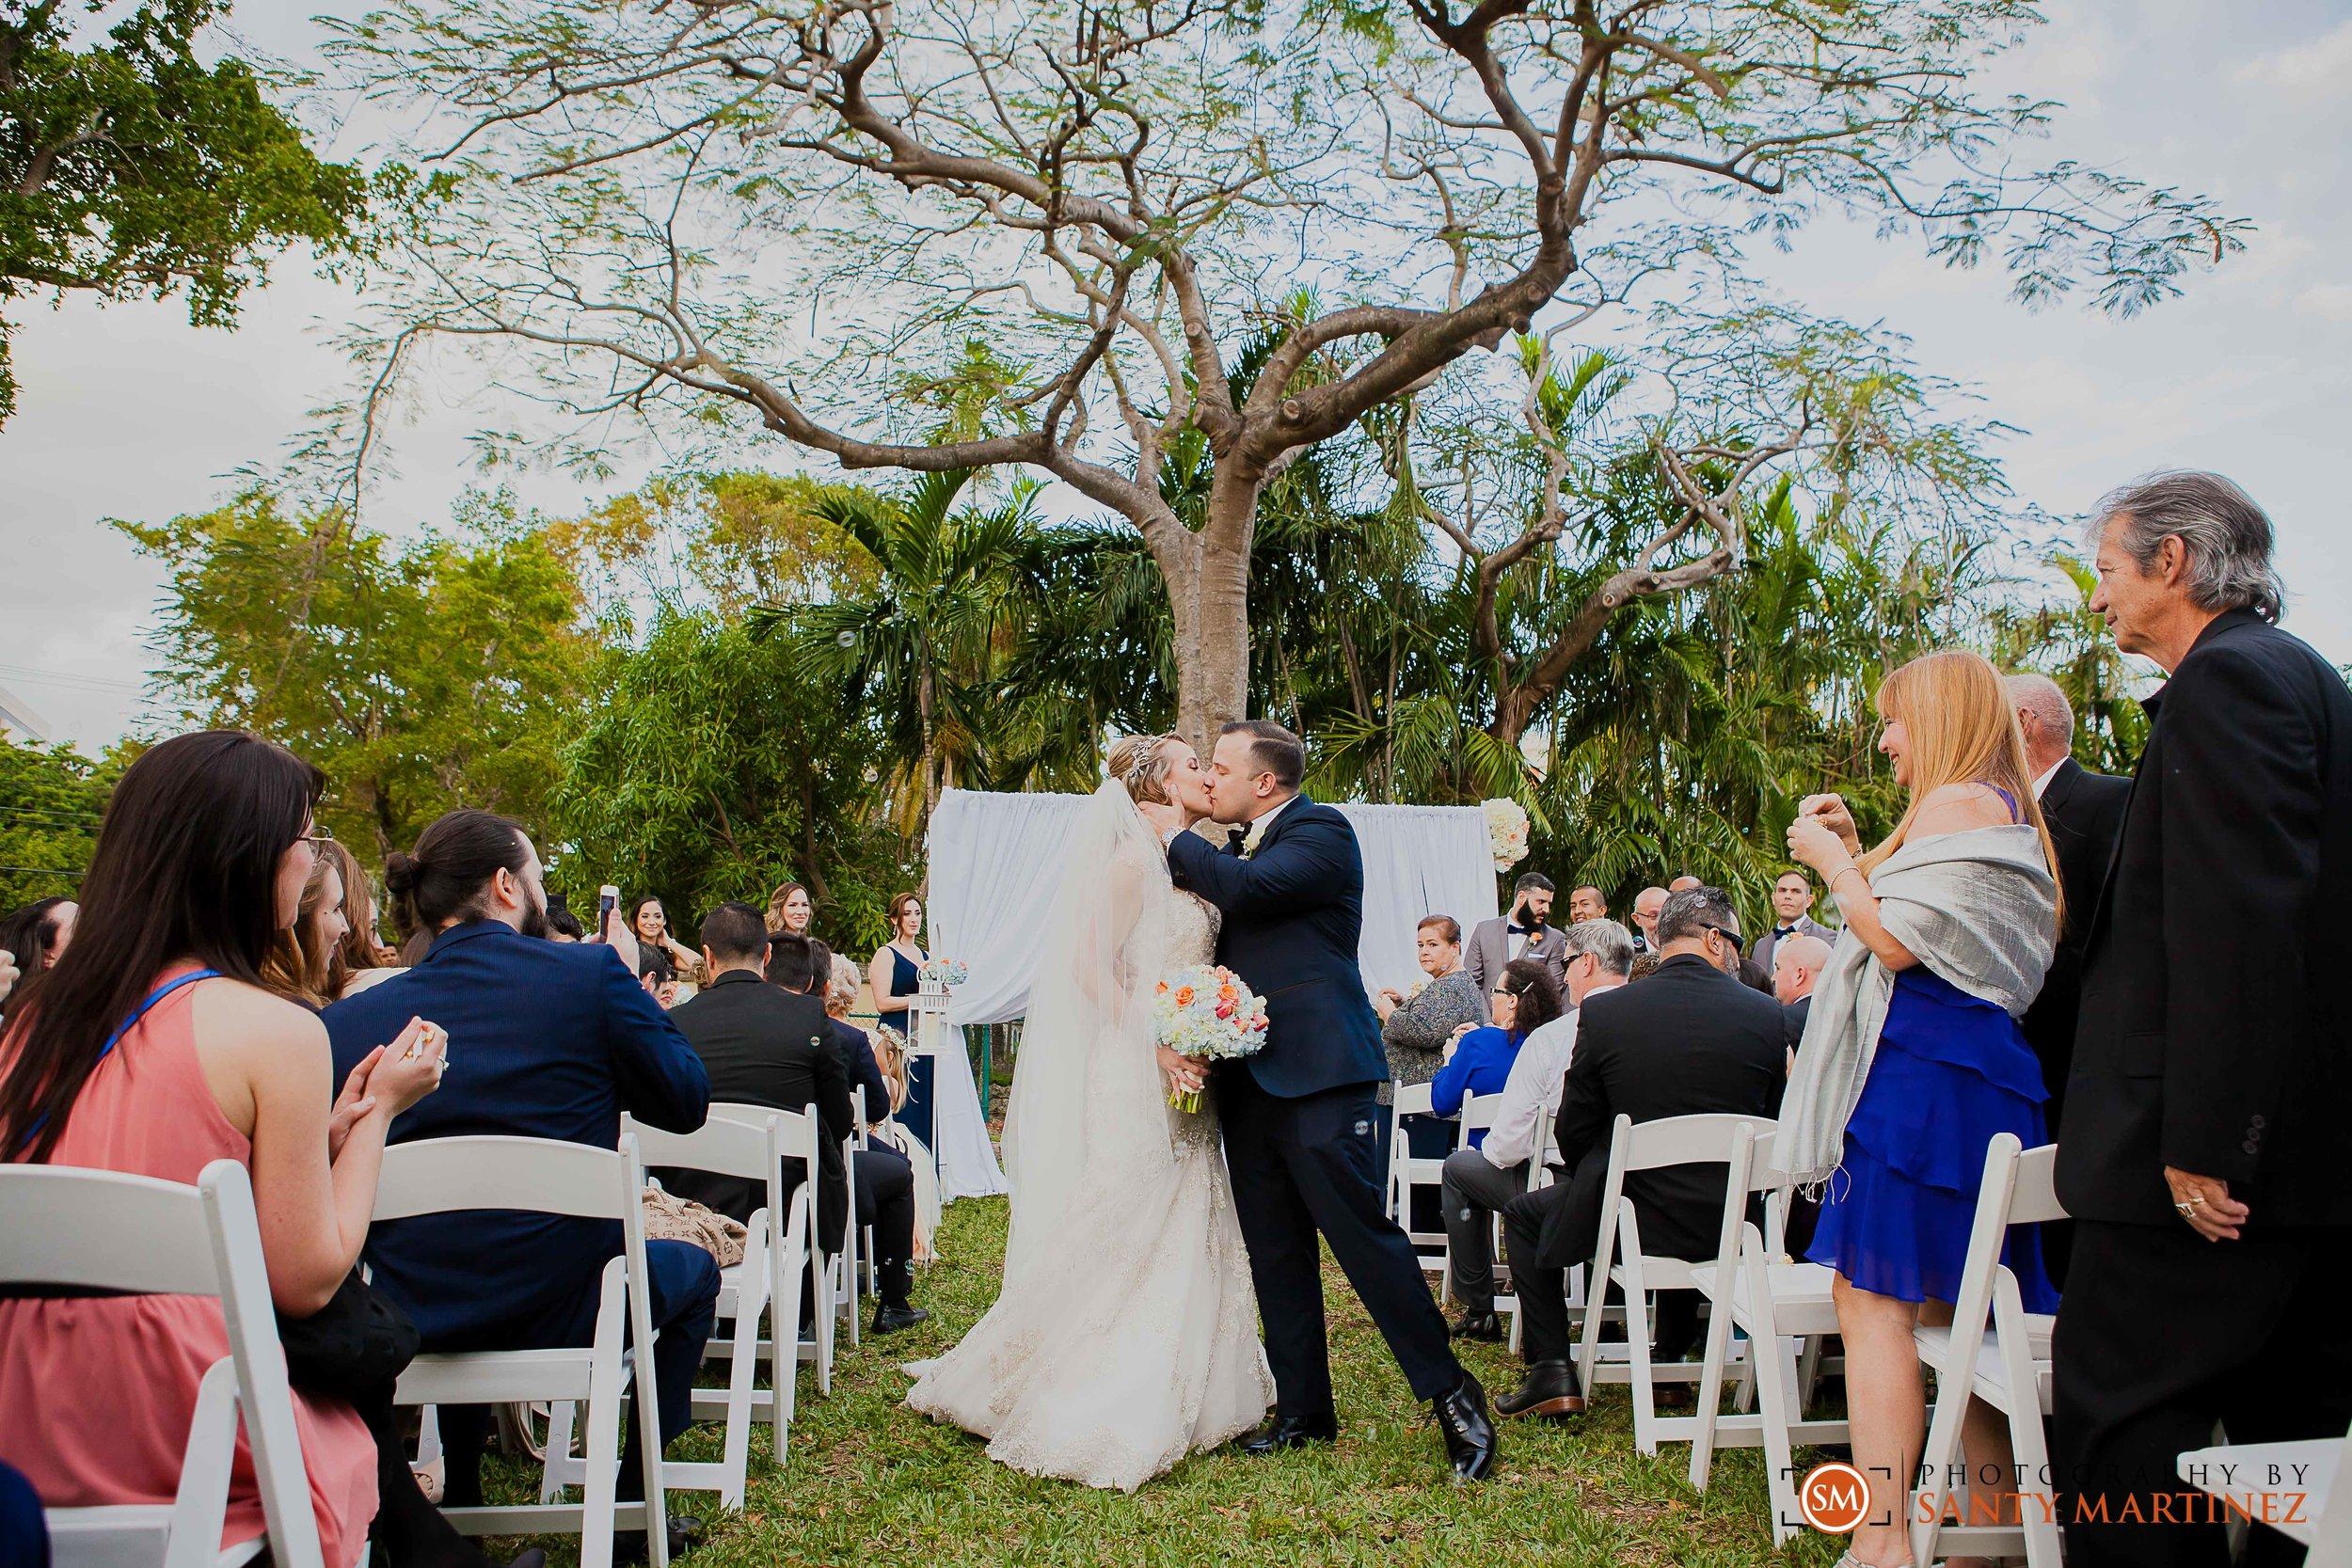 Wedding La Jolla Ballroom - Photography by Santy Martinez-35.jpg